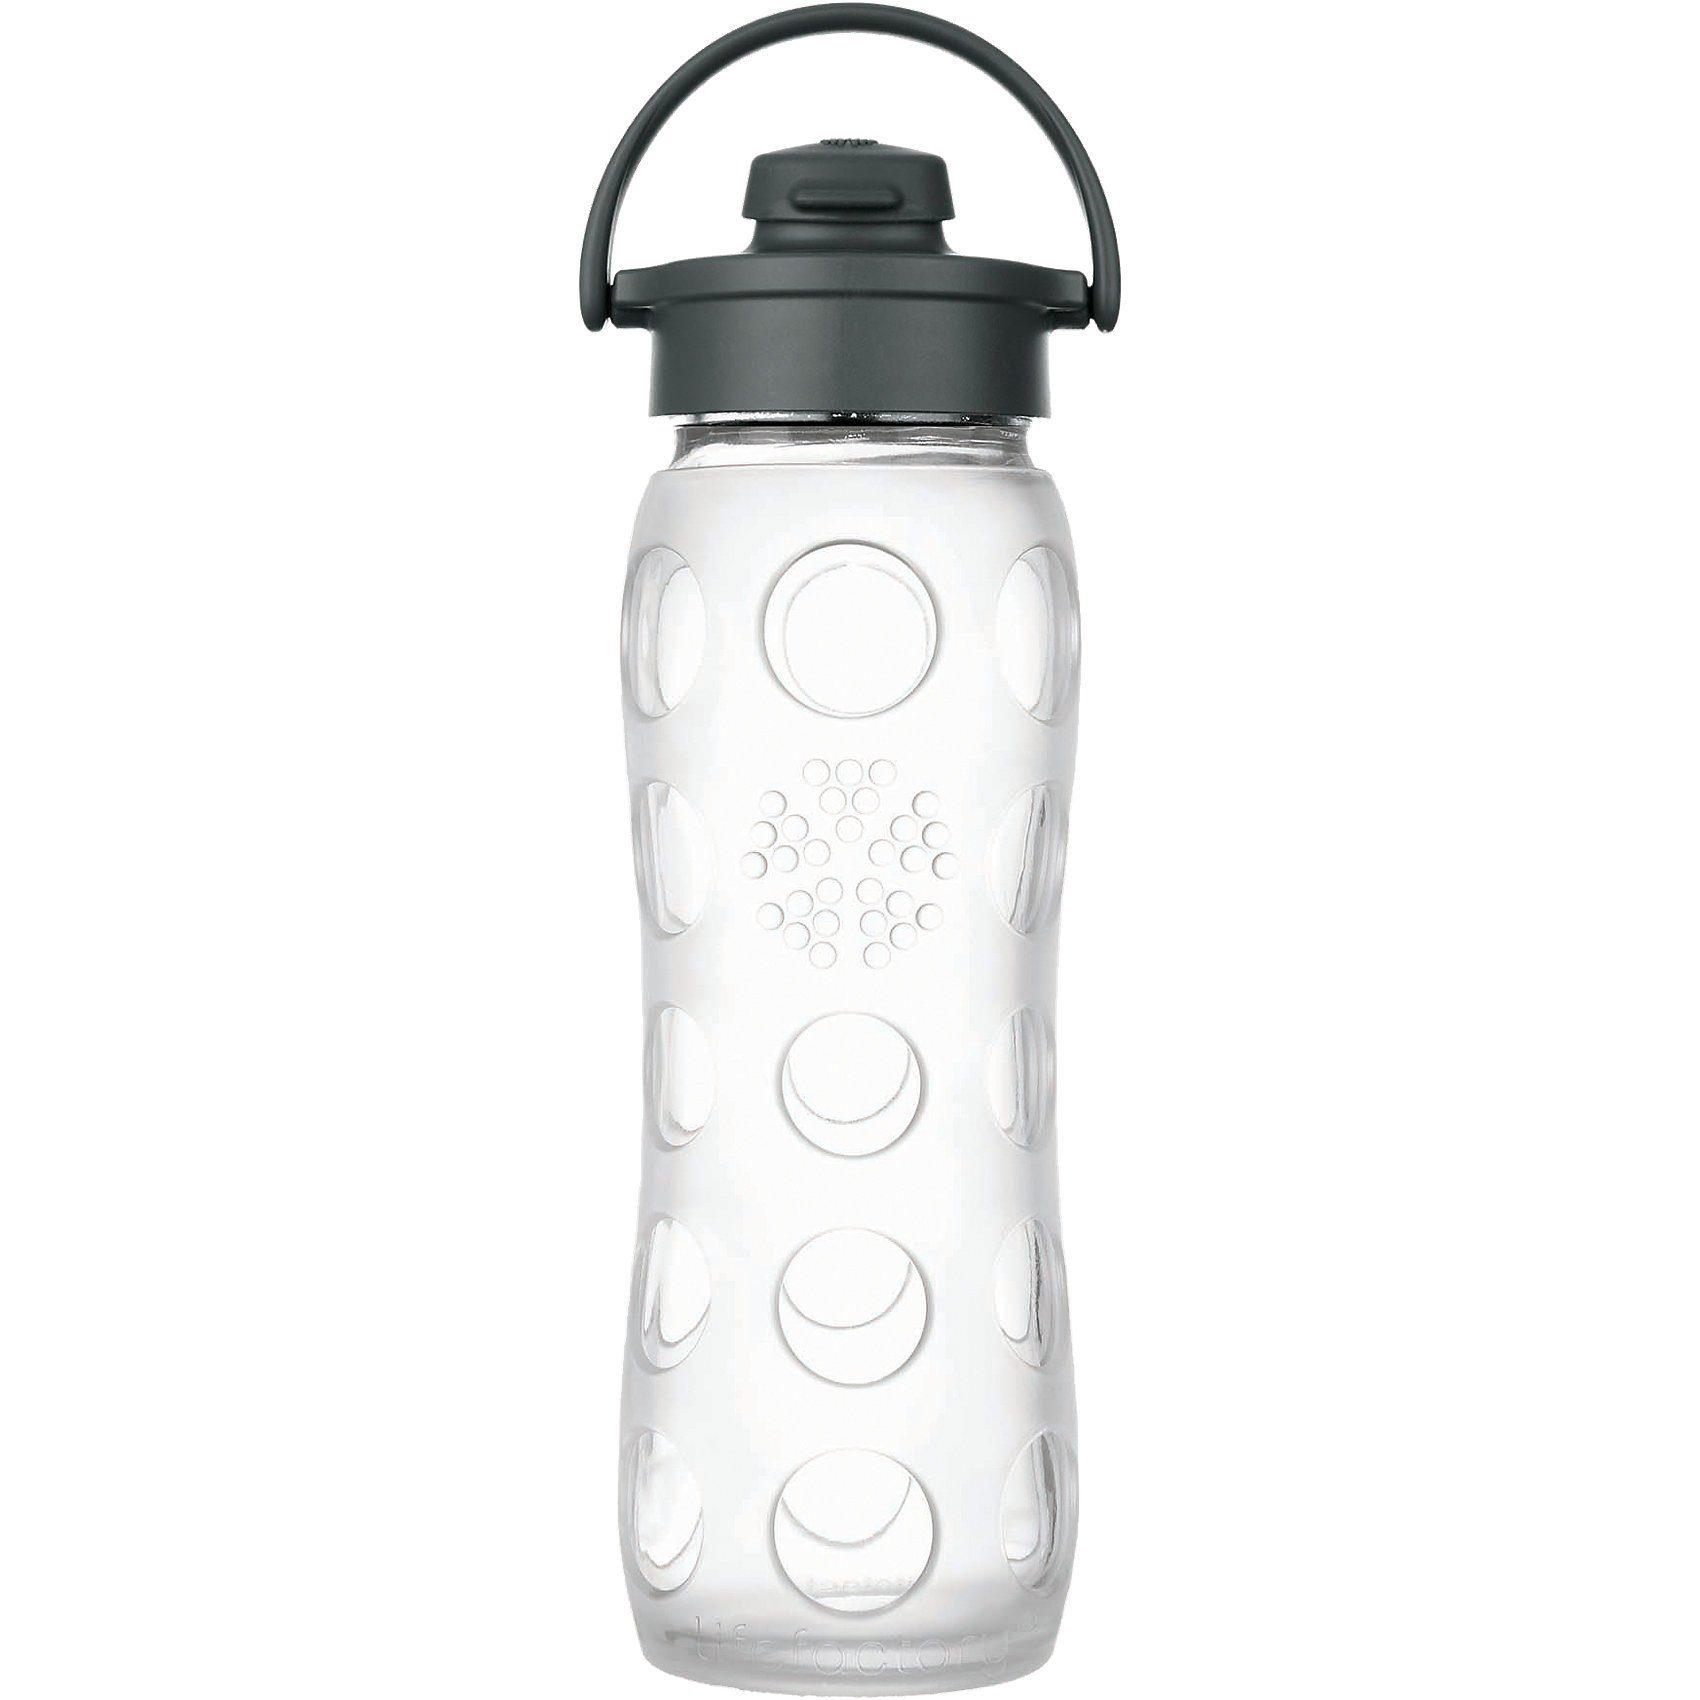 Lifefactory Trinkflasche Glas Transparent Flip Top Cap, 650 ml